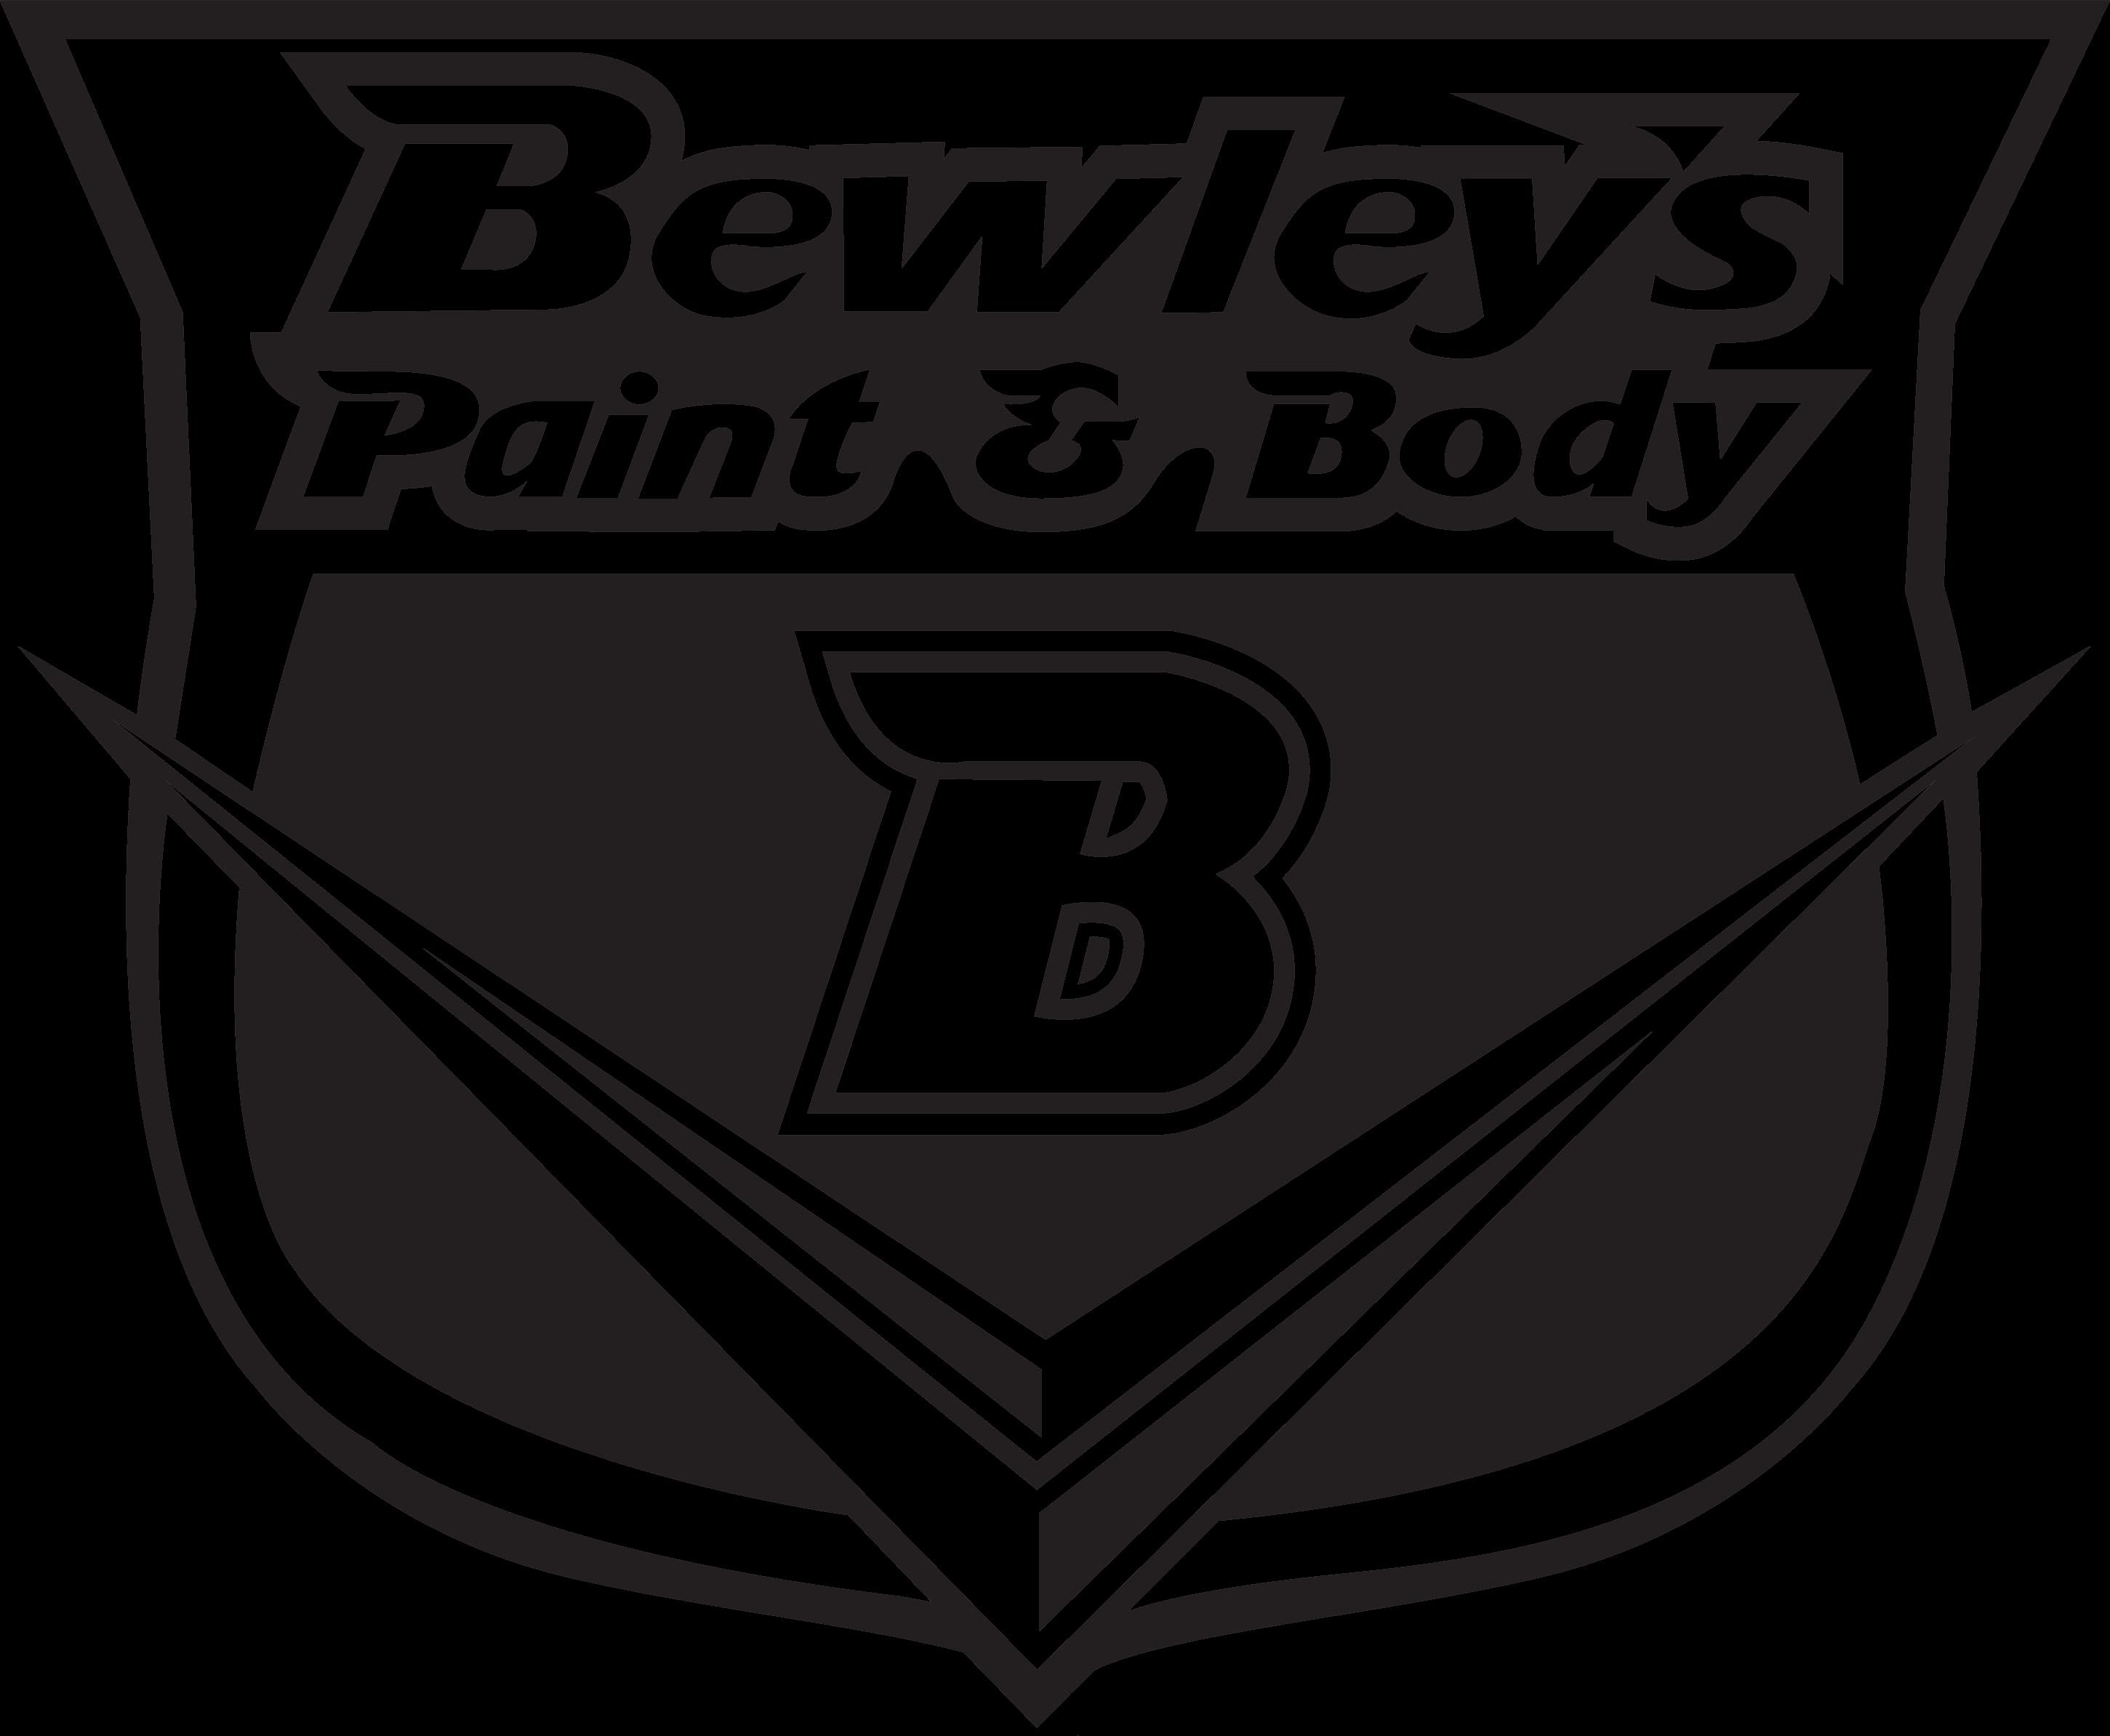 Mitch Moore\'s Artwork Portfolio - Bewley\'s Paint & Body Shop Logo Design